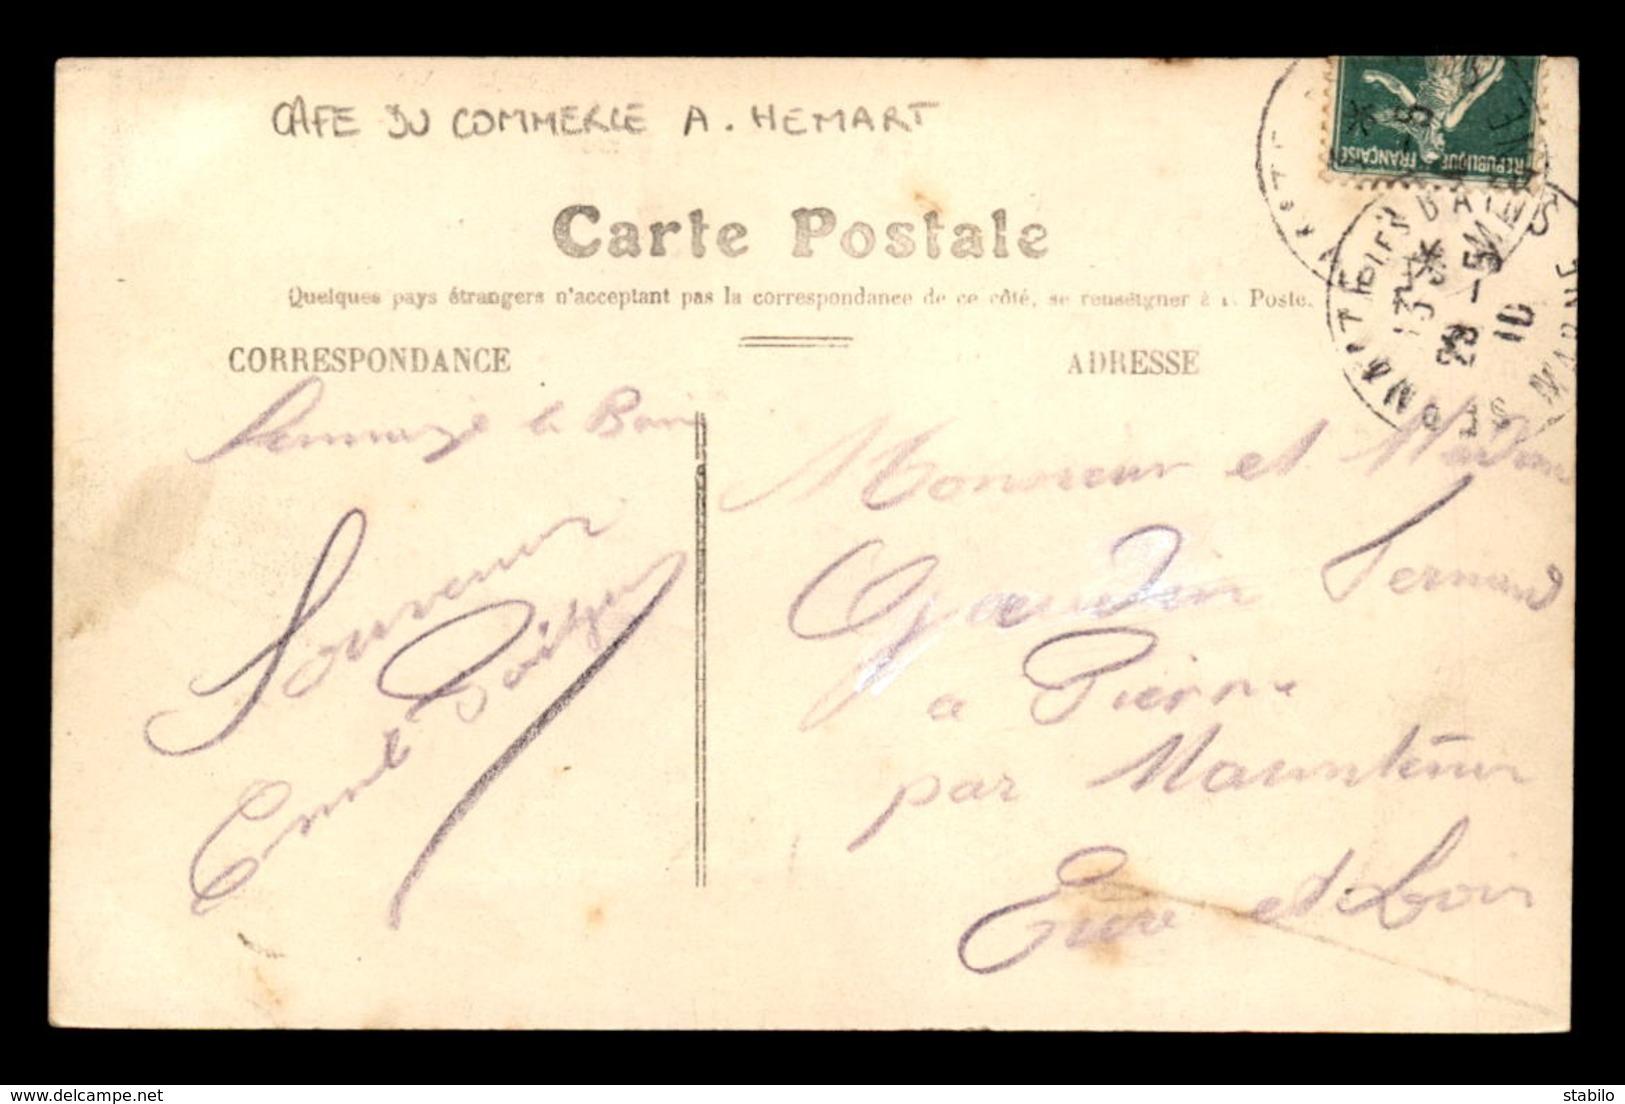 51 - SERMAIZE-LES-BAINS - RUE BENARD - CAFE DU COMMERCE A. HEMART - Sermaize-les-Bains